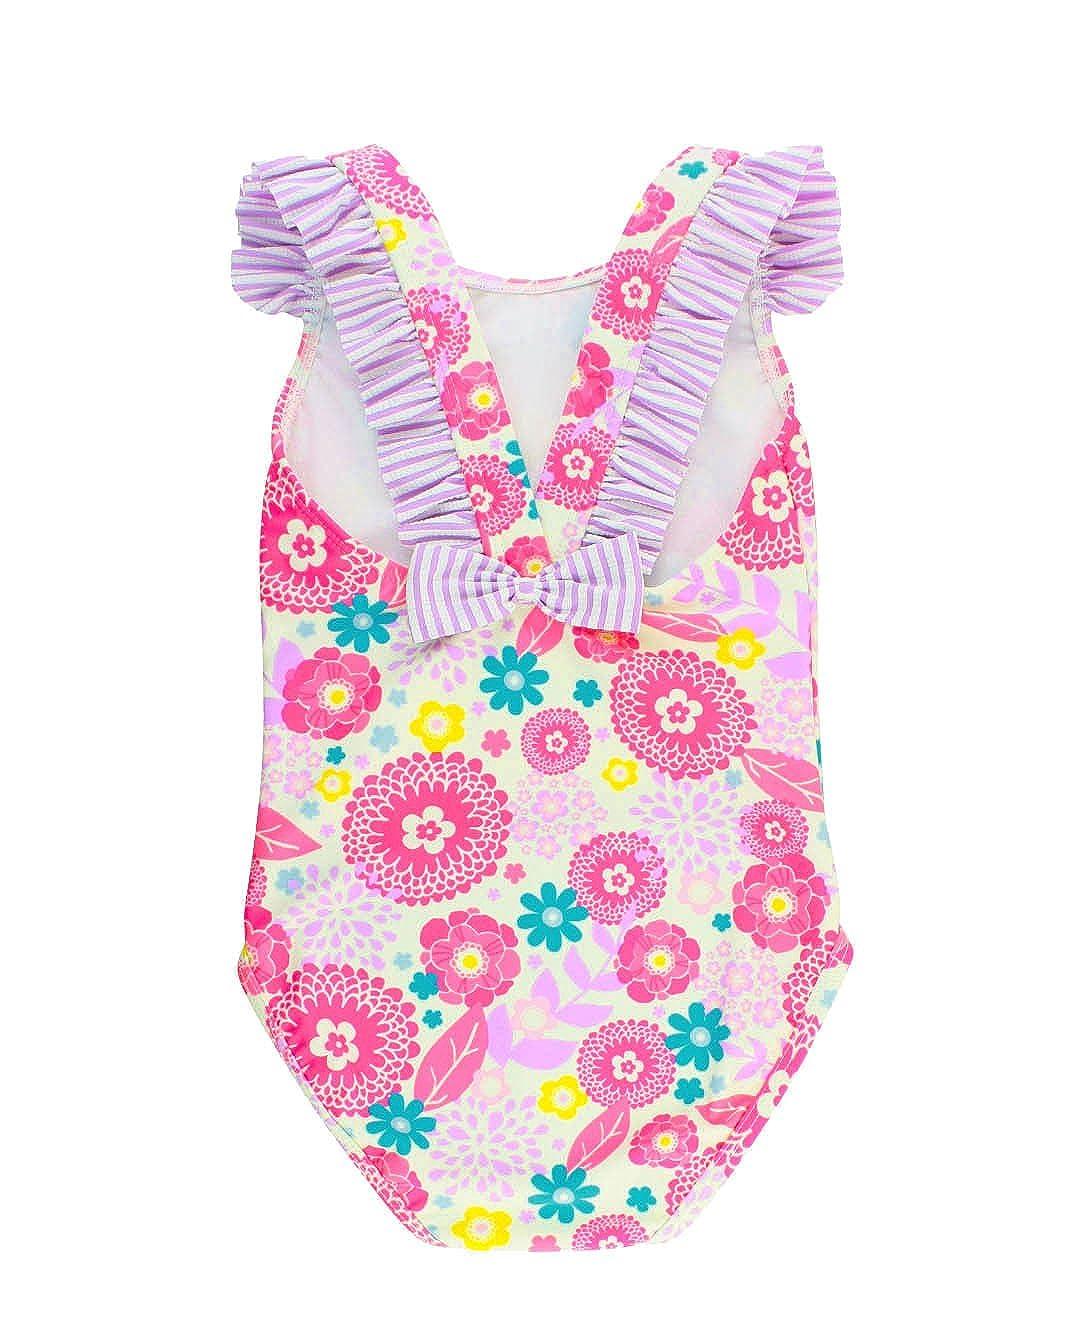 RuffleButts Baby/Toddler Girls Floral Seersucker Ruffle Strap One Piece Swimsuit SWSPUXX-1PBB-BABY